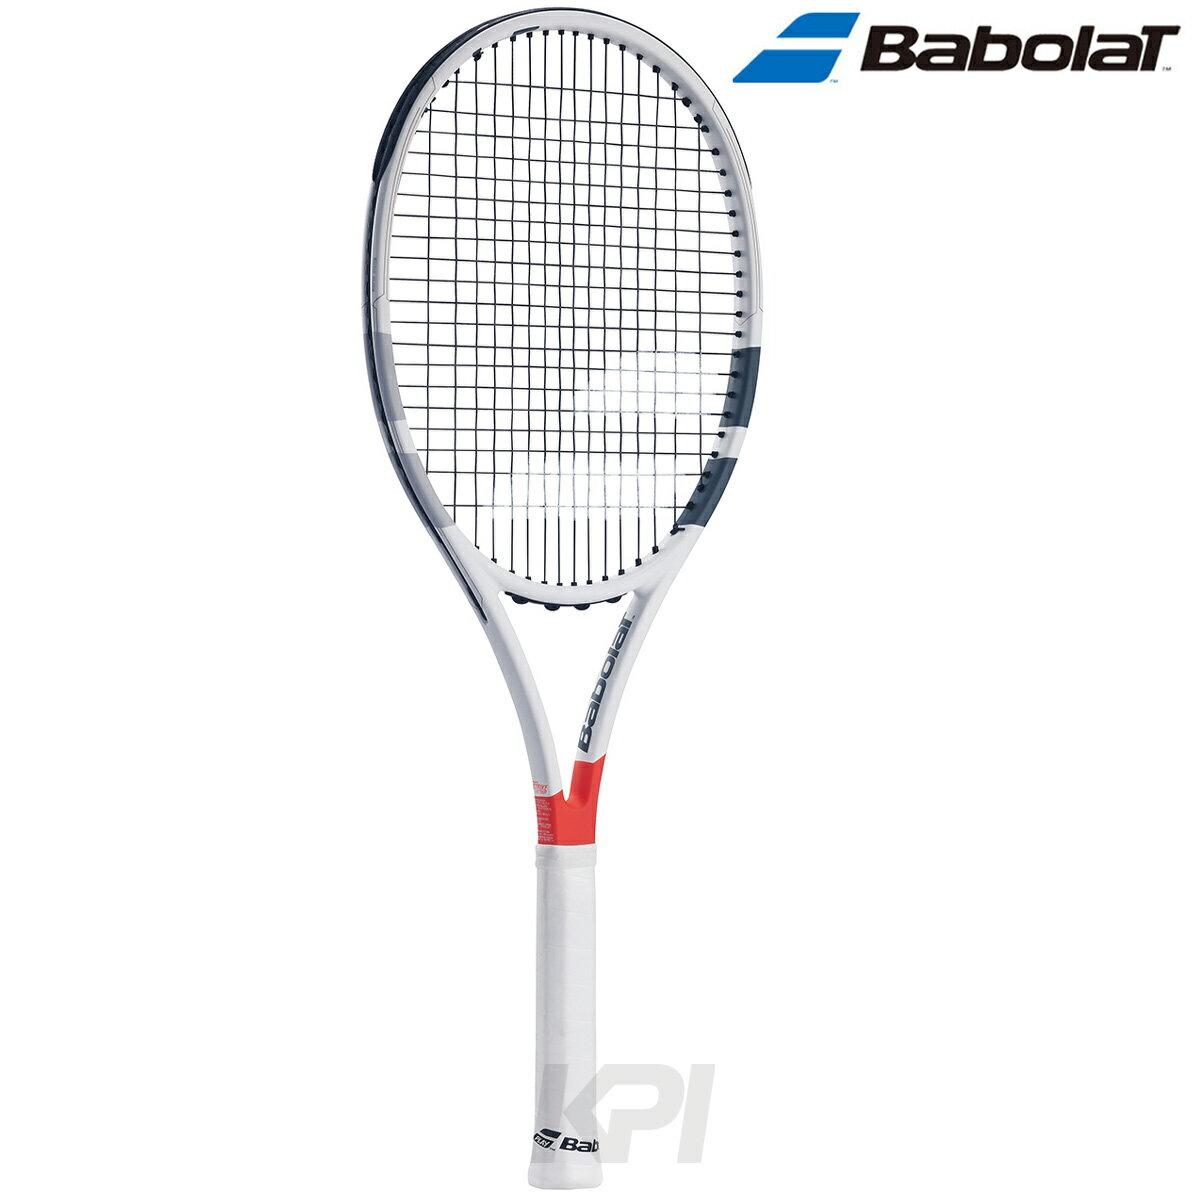 「Babolat(バボラ)「PURE STRIKE VS TOUR(ピュアストライクVSツアー) BF101312」硬式テニスラケット【prospo】